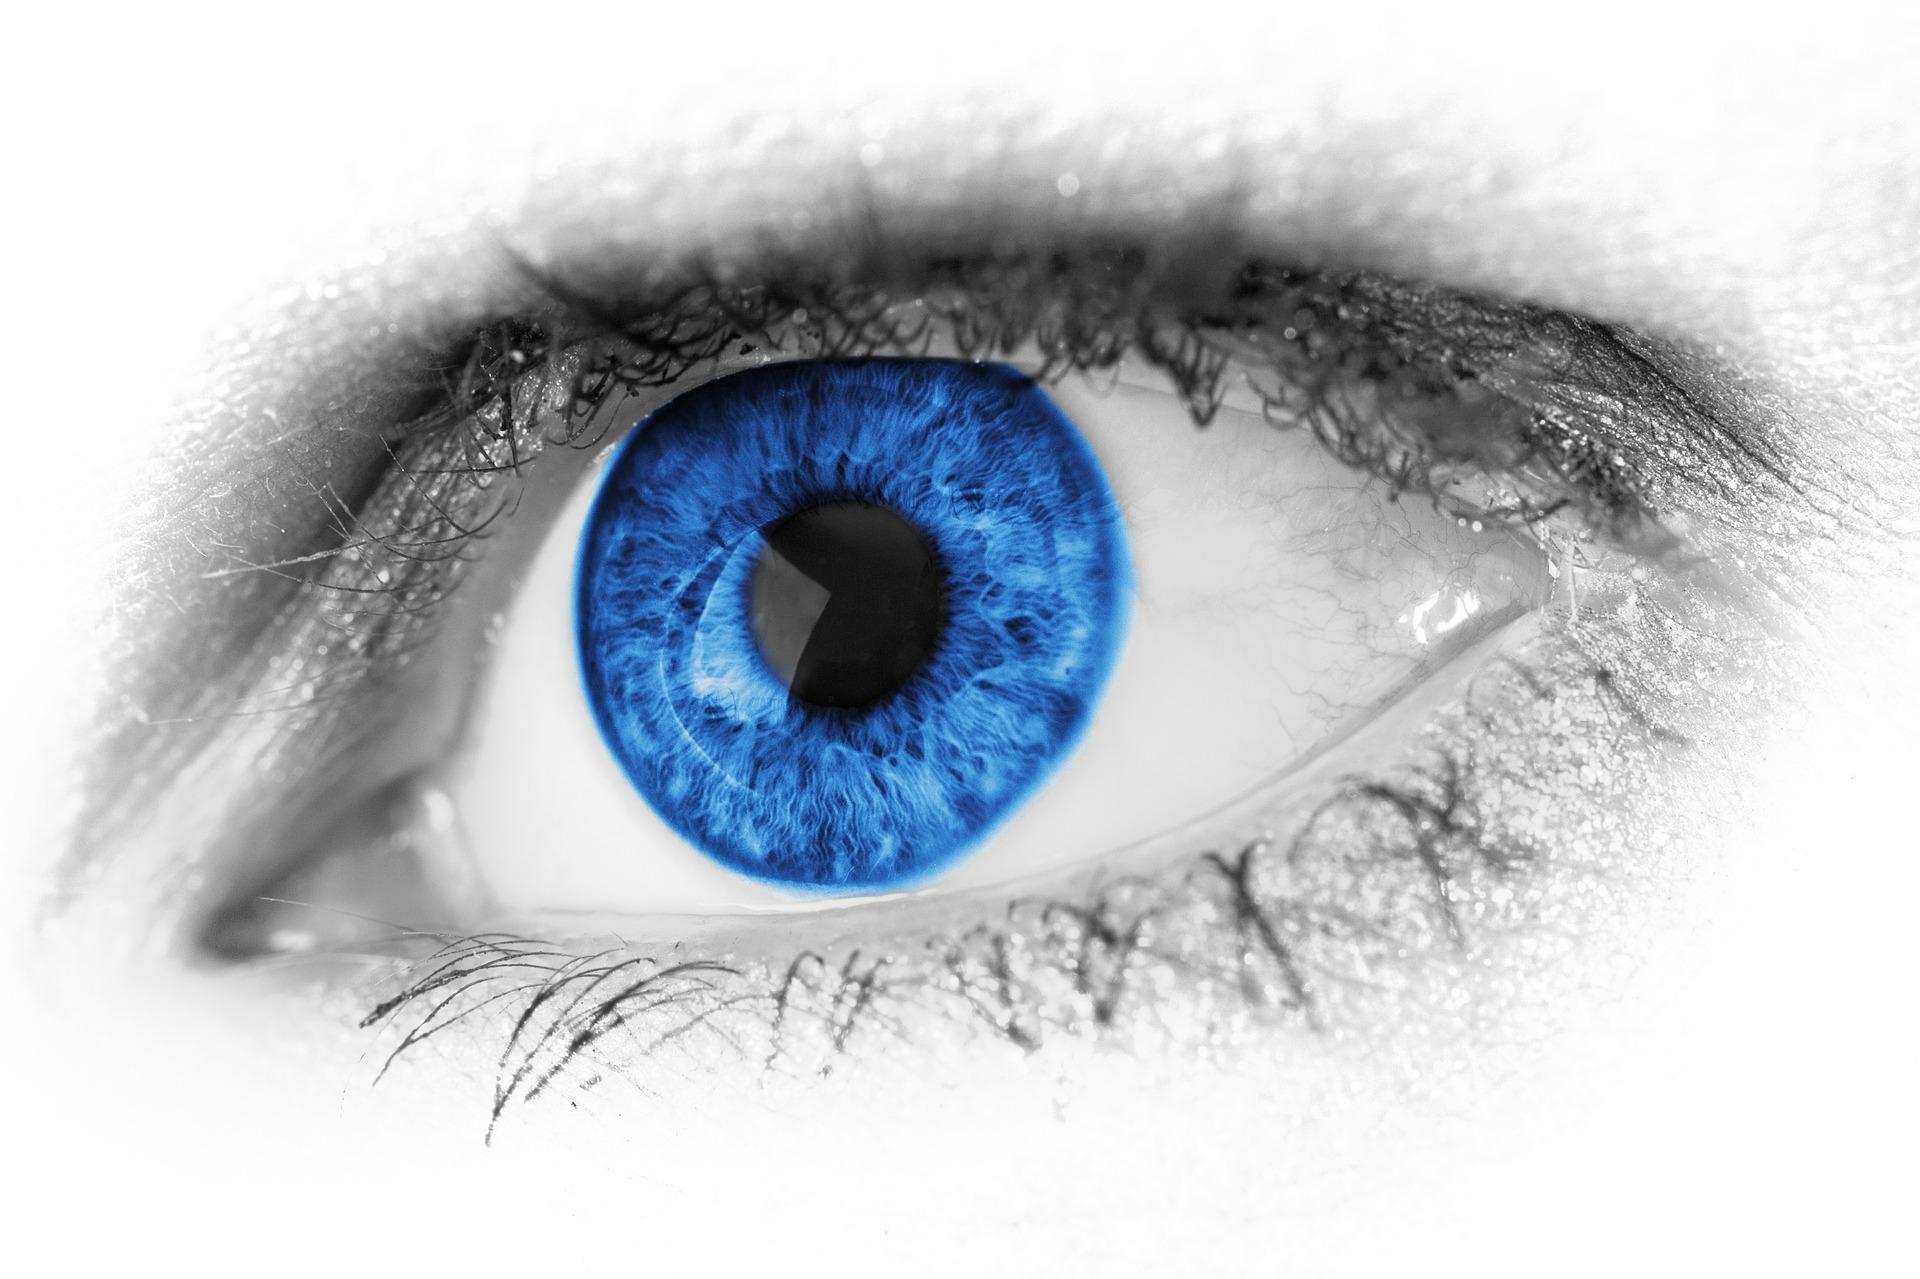 Blue_Eye_Gemahlt